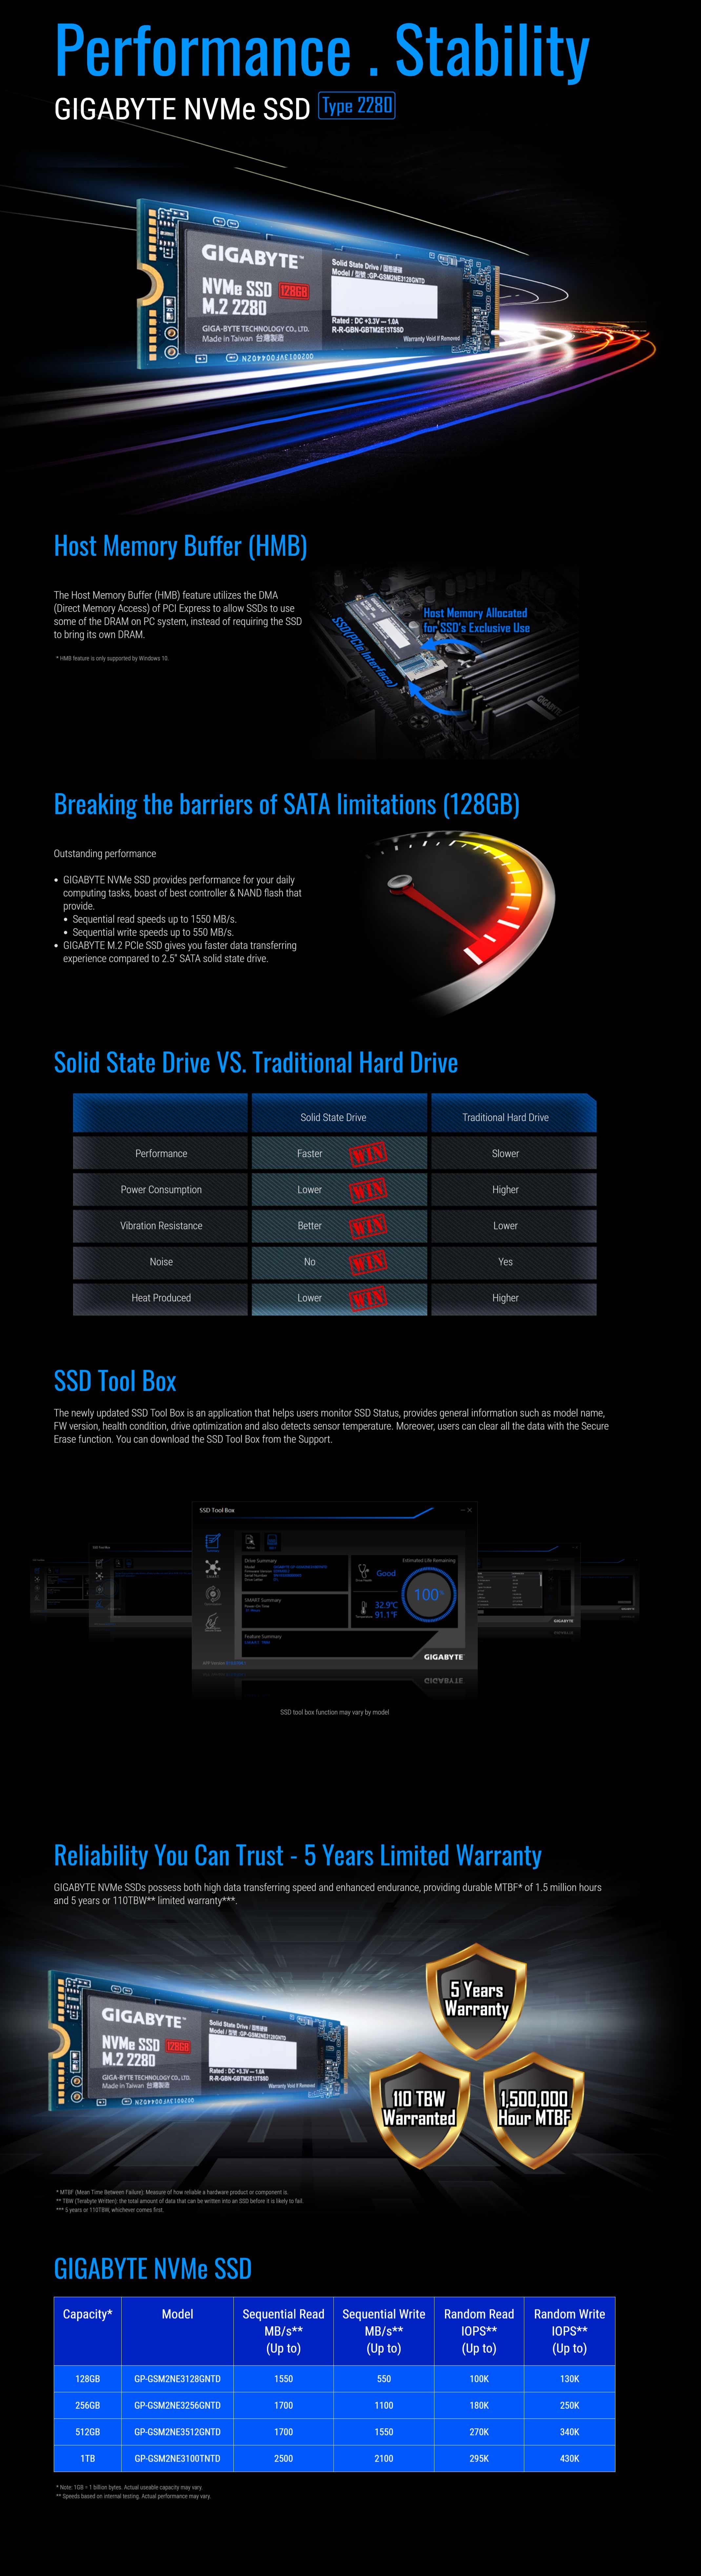 screencapture-gigabyte-au-Solid-State-Drive-GIGABYTE-NVMe-SSD-128GB-2020-05-02-13_44_30.jpg